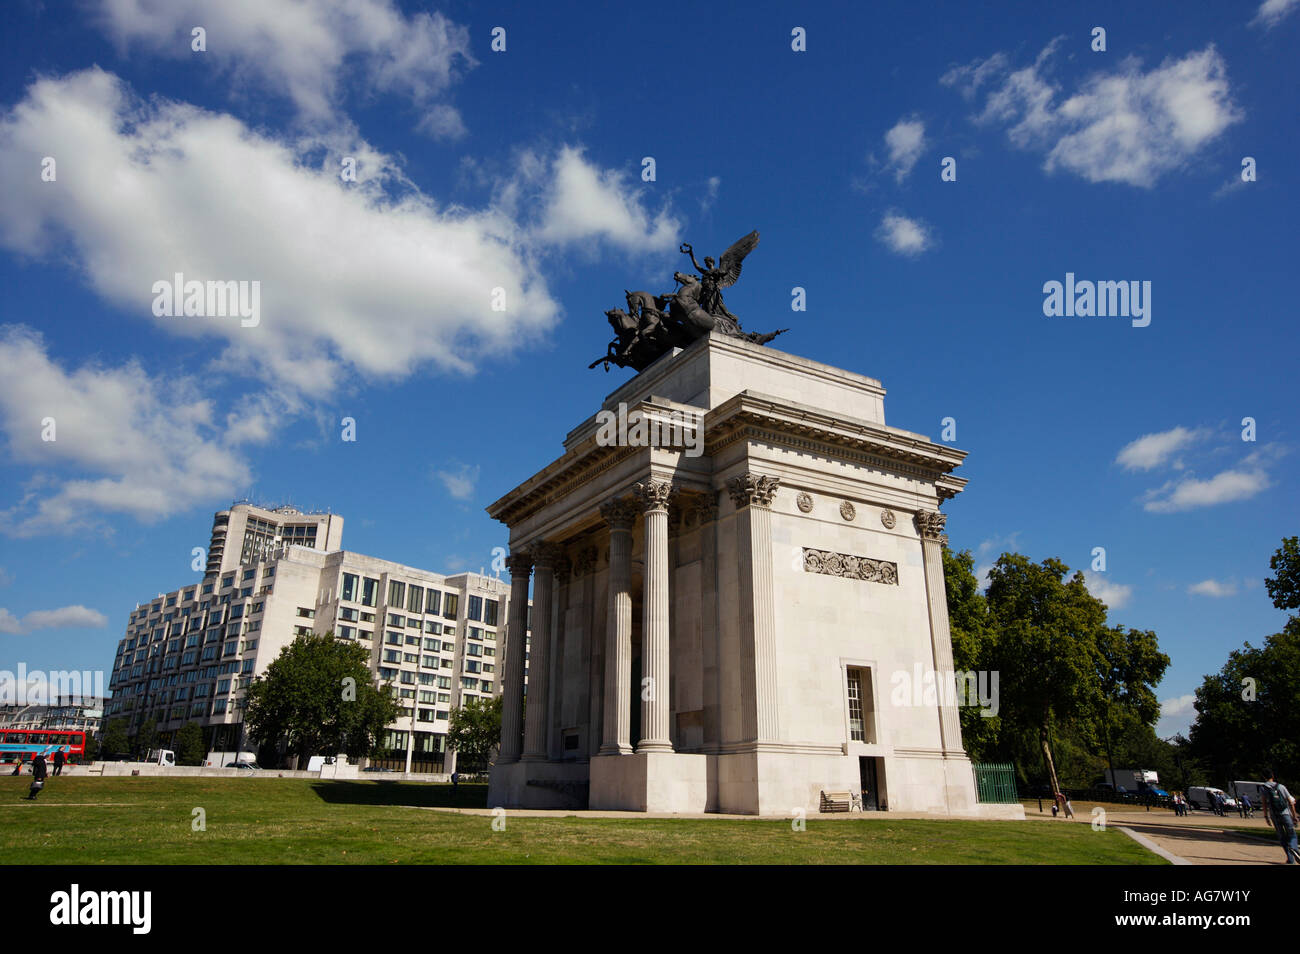 The Wellington Arch on Hyde Park Corner in London UK - Stock Image